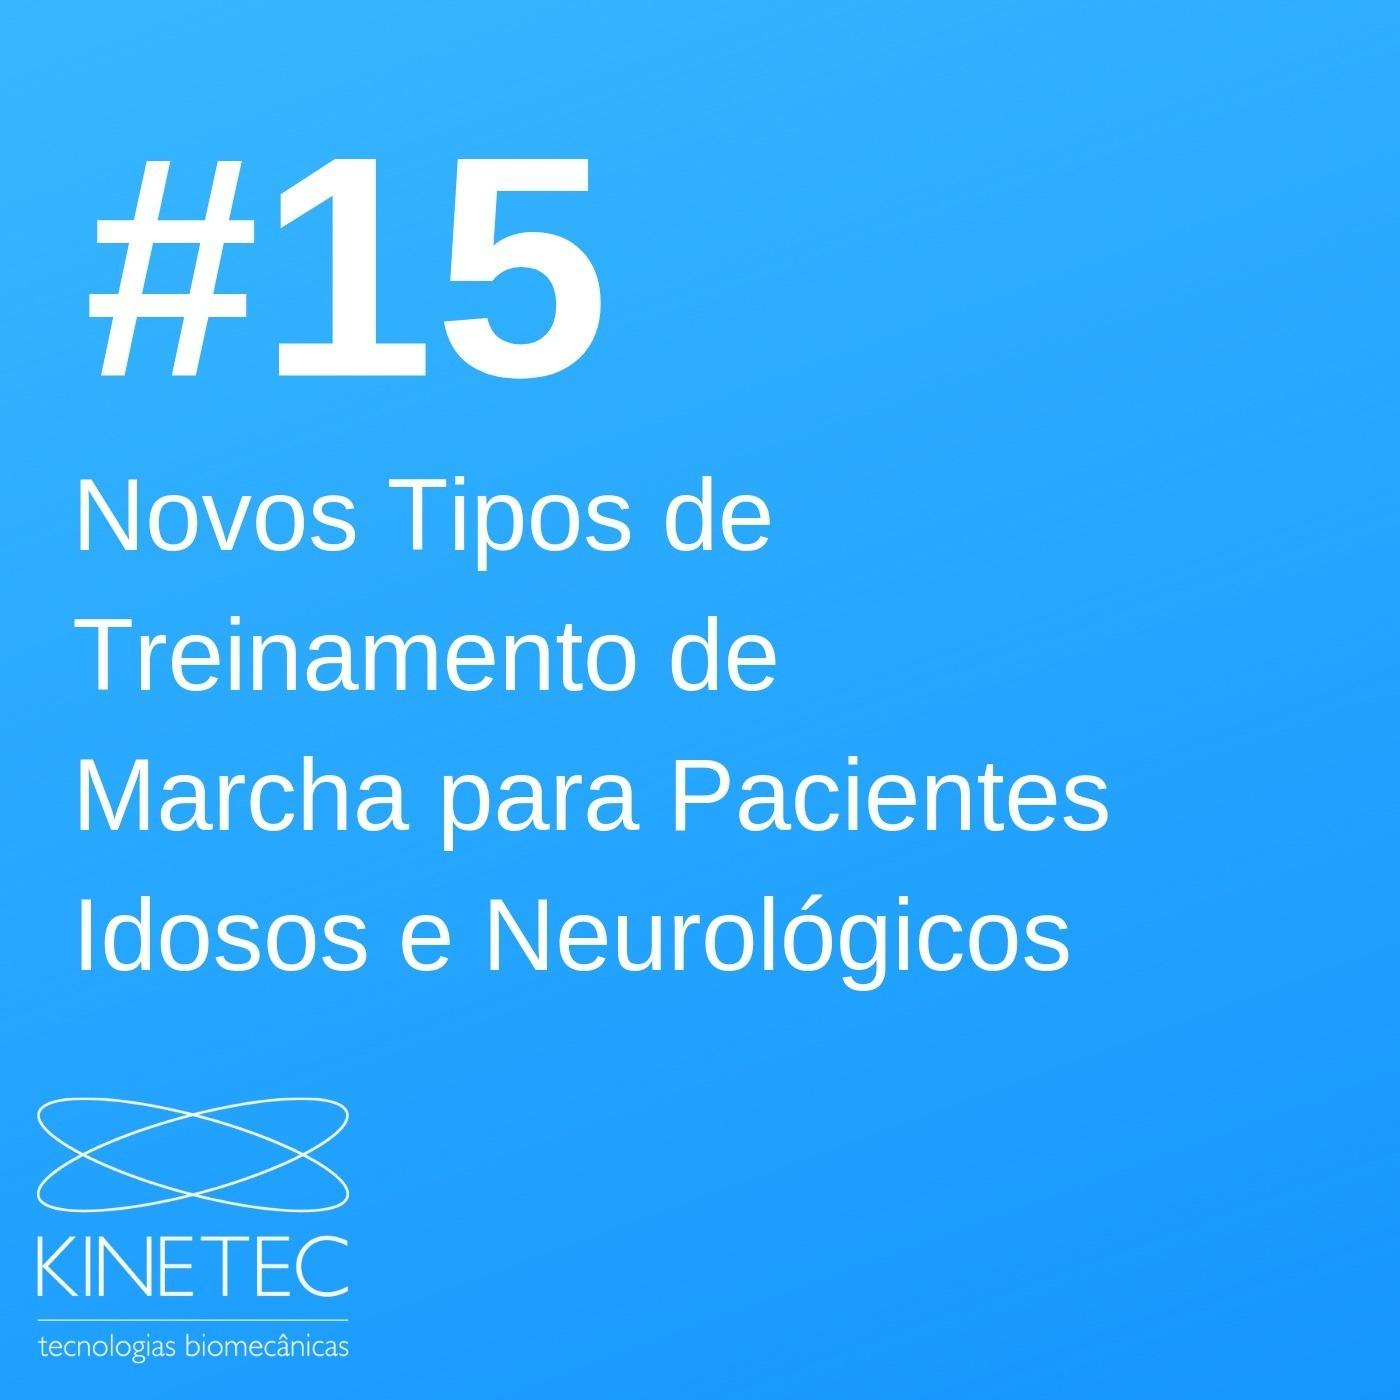 #015 Novos Tipos de Treinamentos de Marcha para Pacientes Idosos e Neurológicos